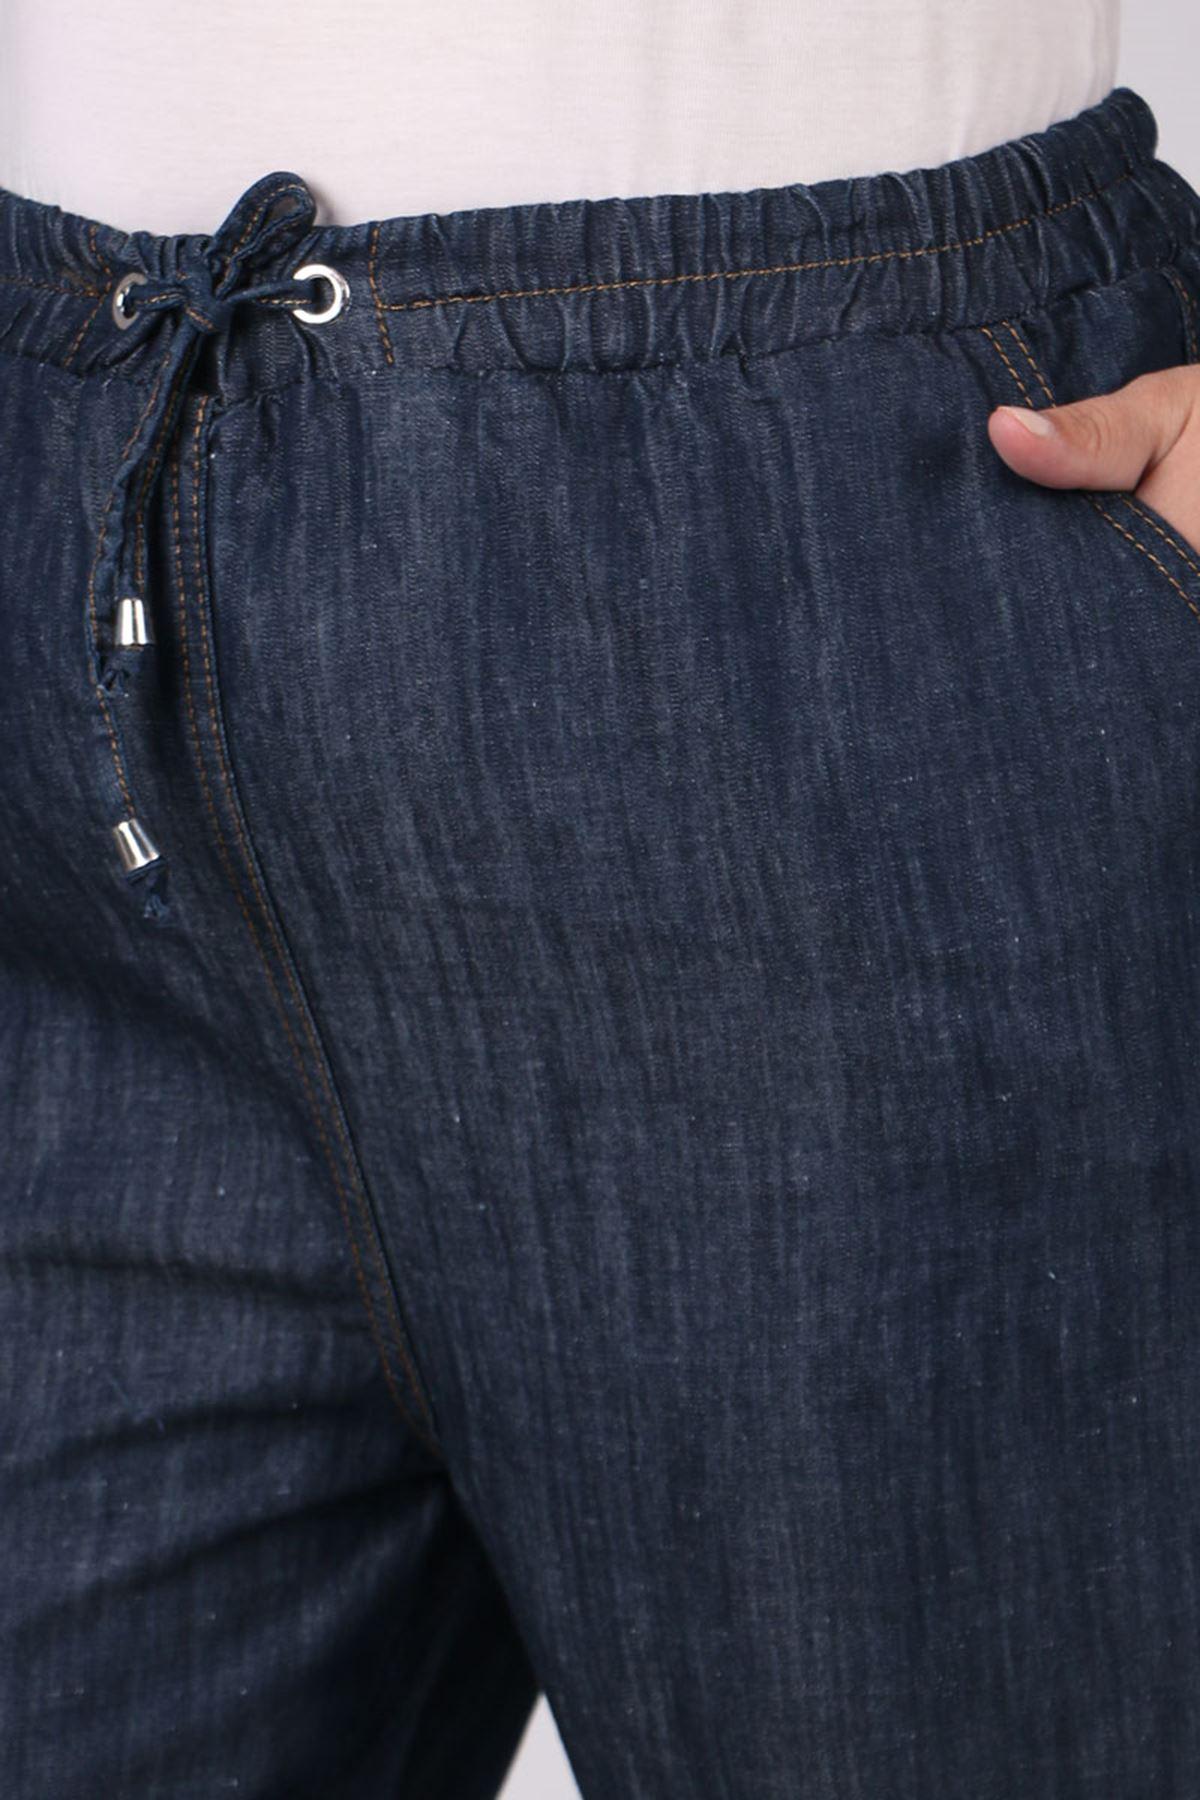 9173 Büyük Beden Dar Paça Kot Pantolon - Koyu Lacivert